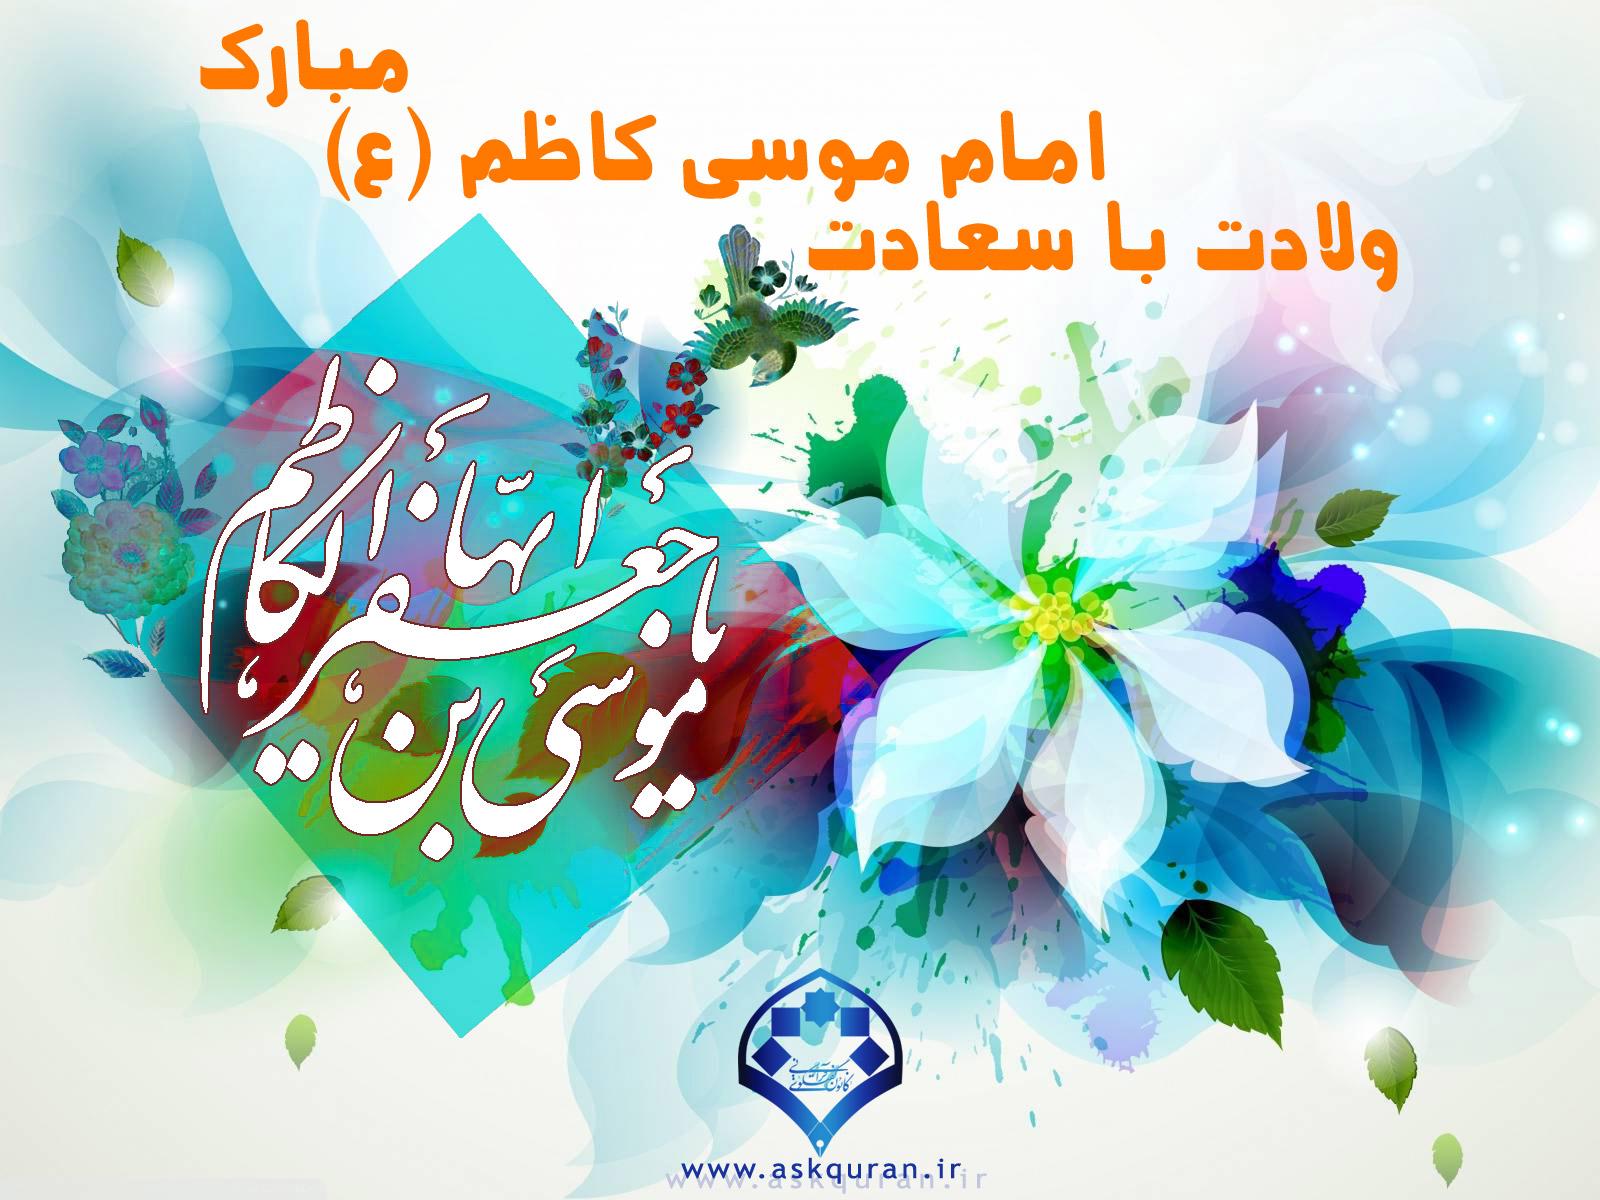 پیامک های تبریک ولادت امام موسی کاظم علیه السلام